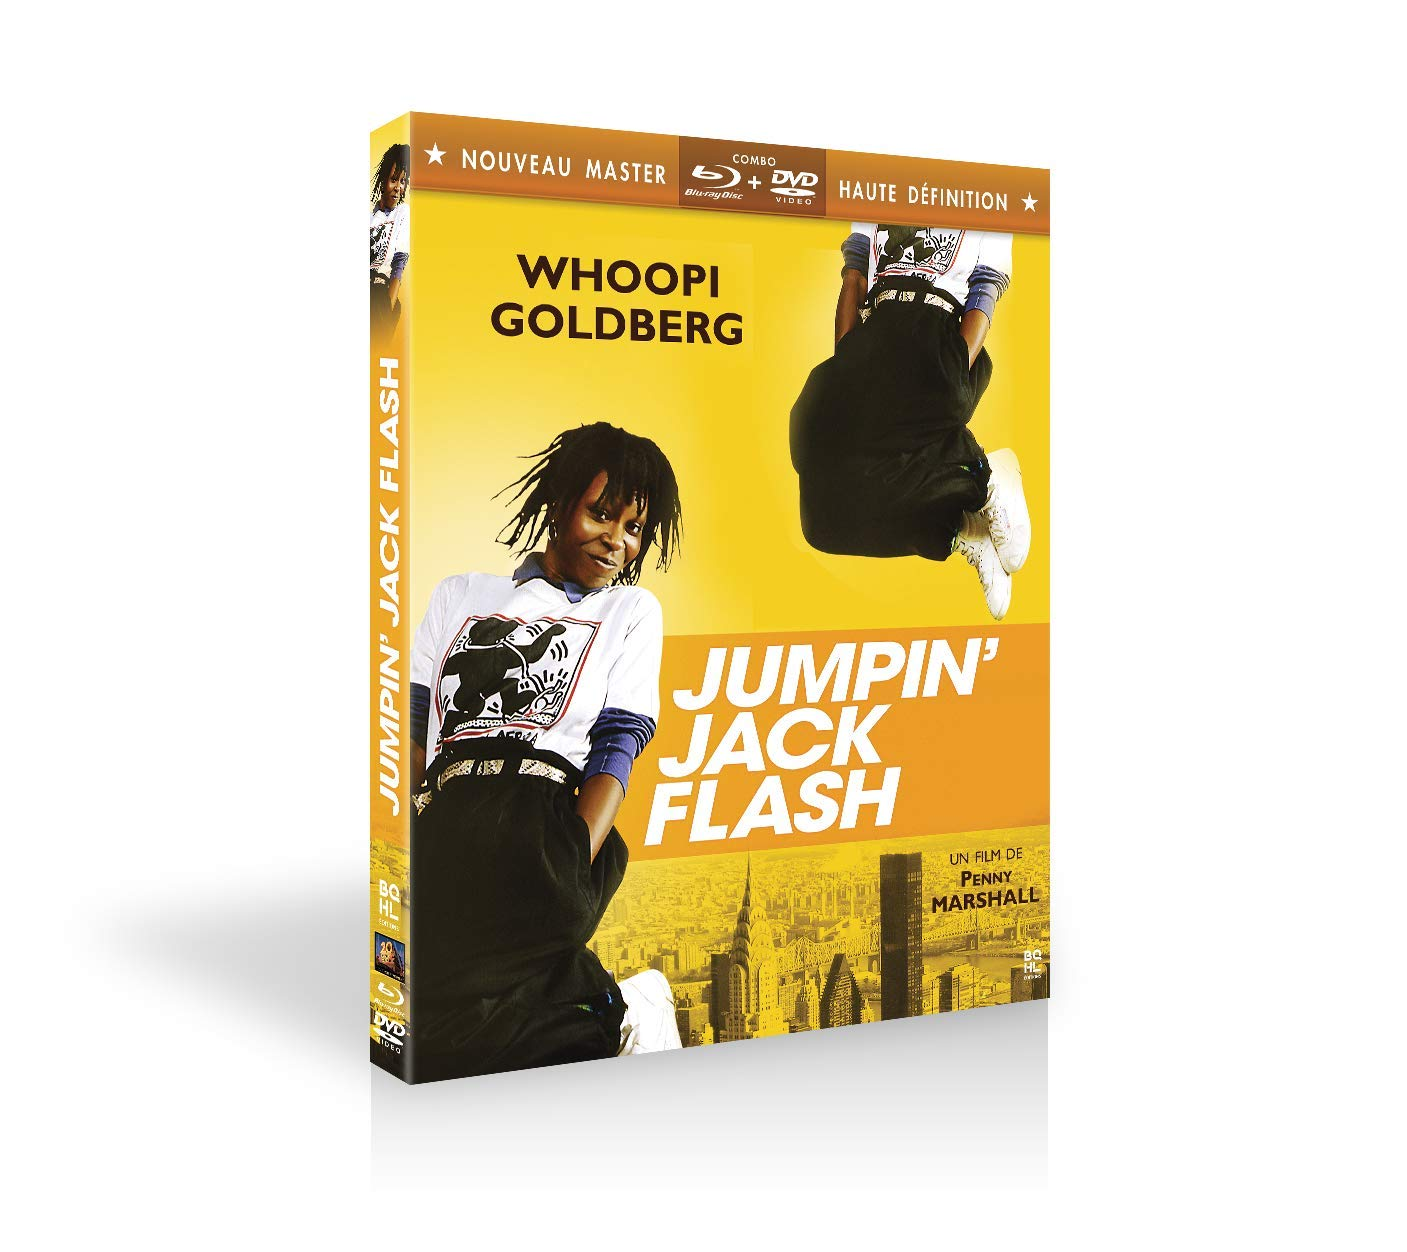 Jumpin'Jack flash